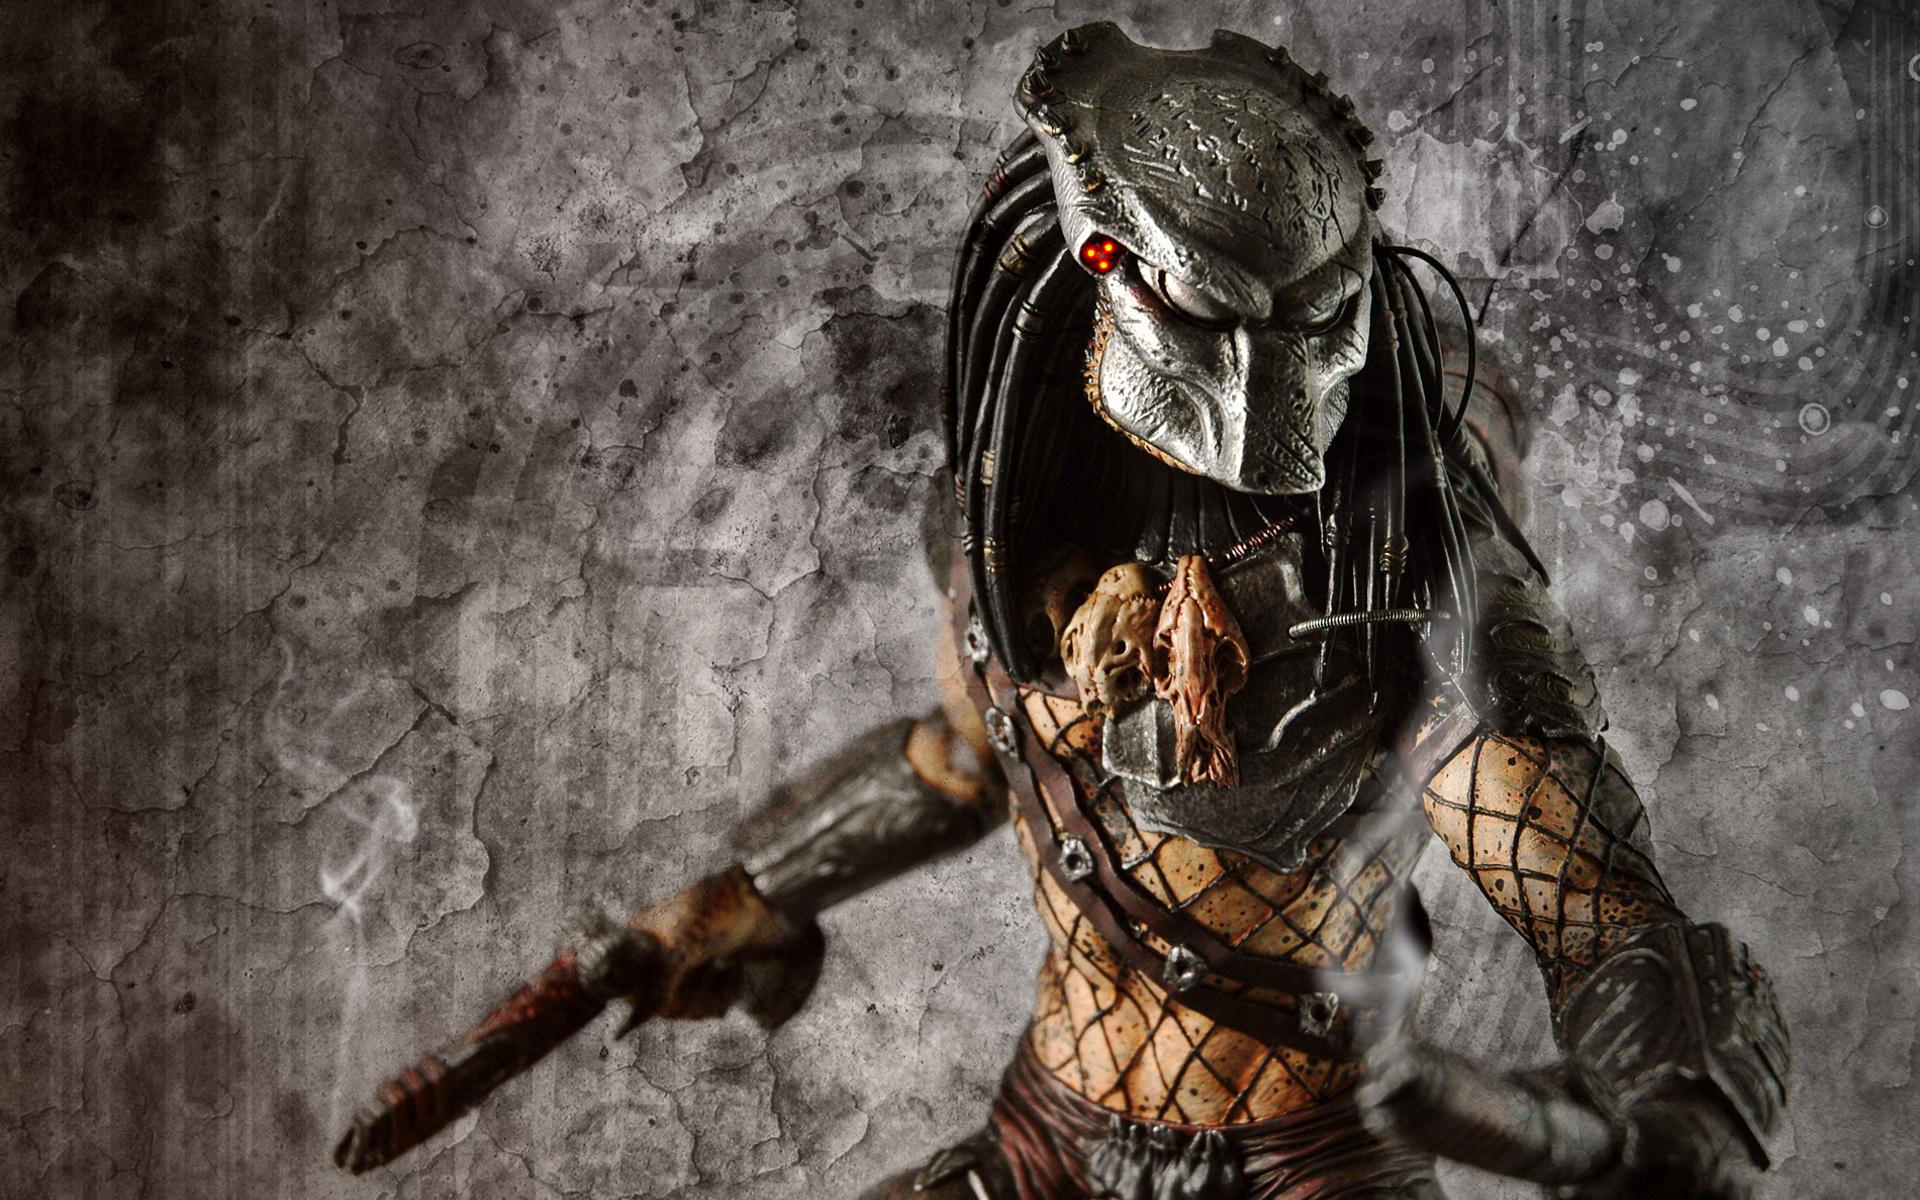 Predator Costumes Models Kits and Collectibles Predator Stuff 1920x1200